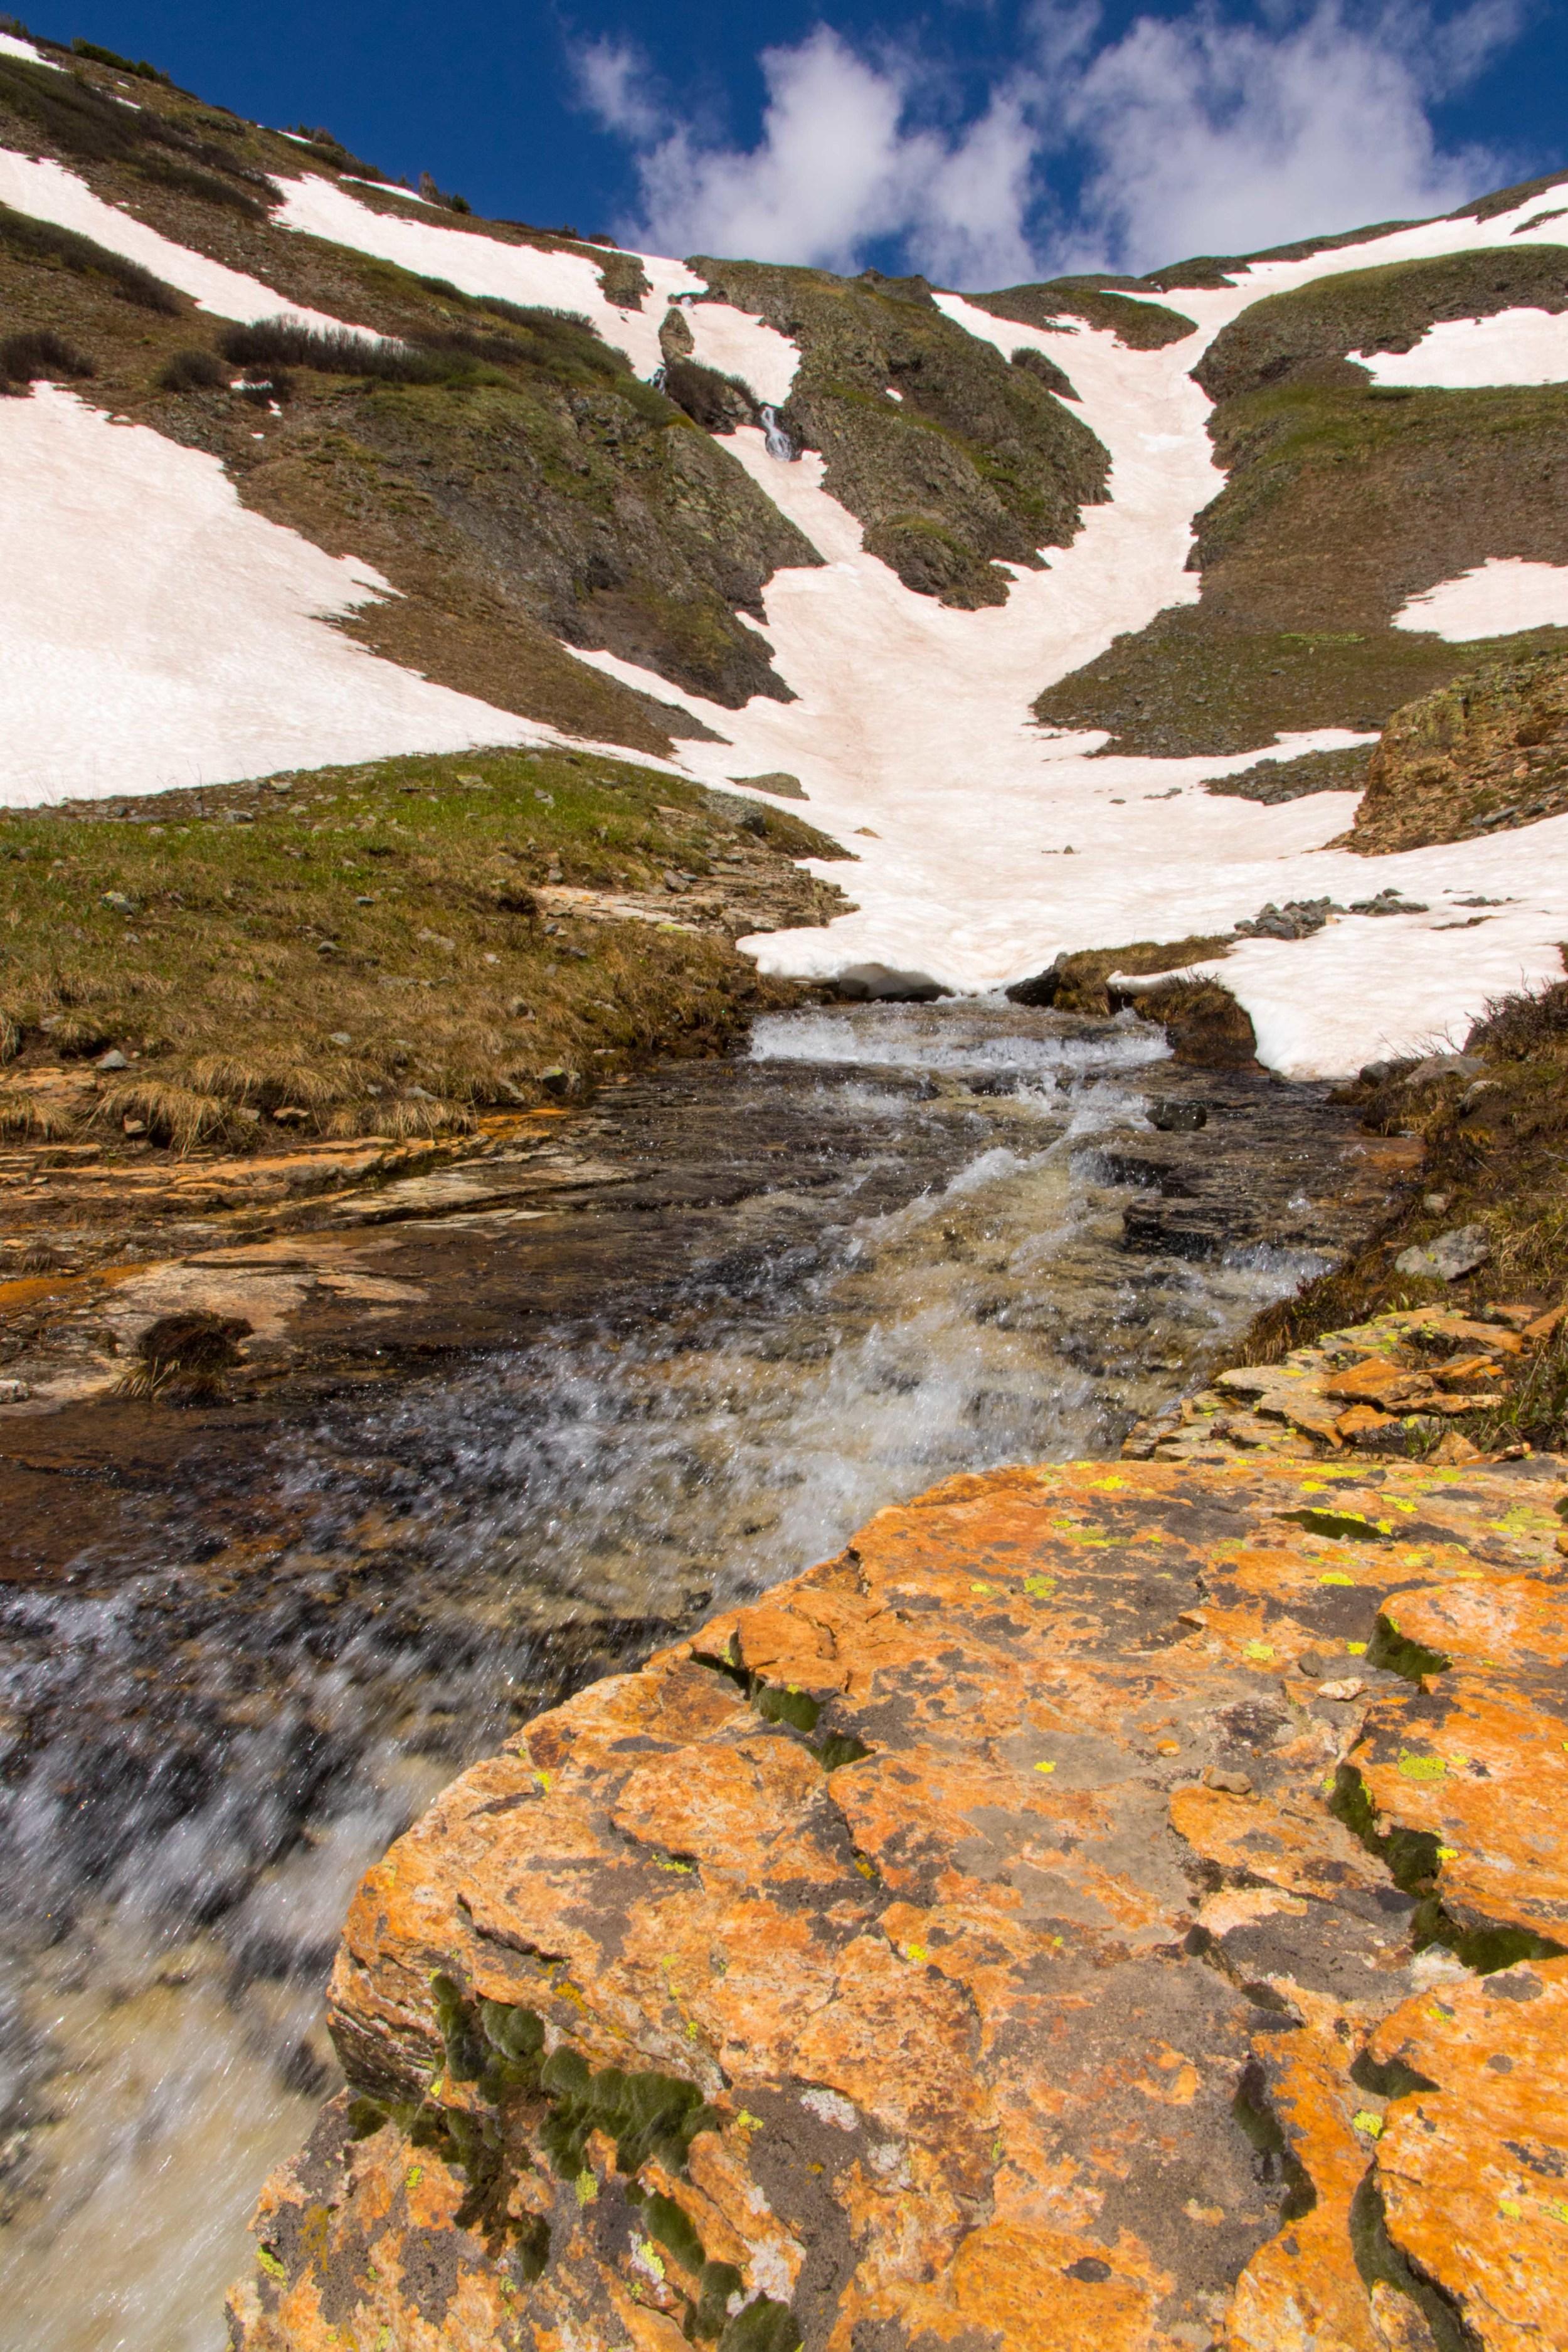 Black Bear Waterfall, Image #0486